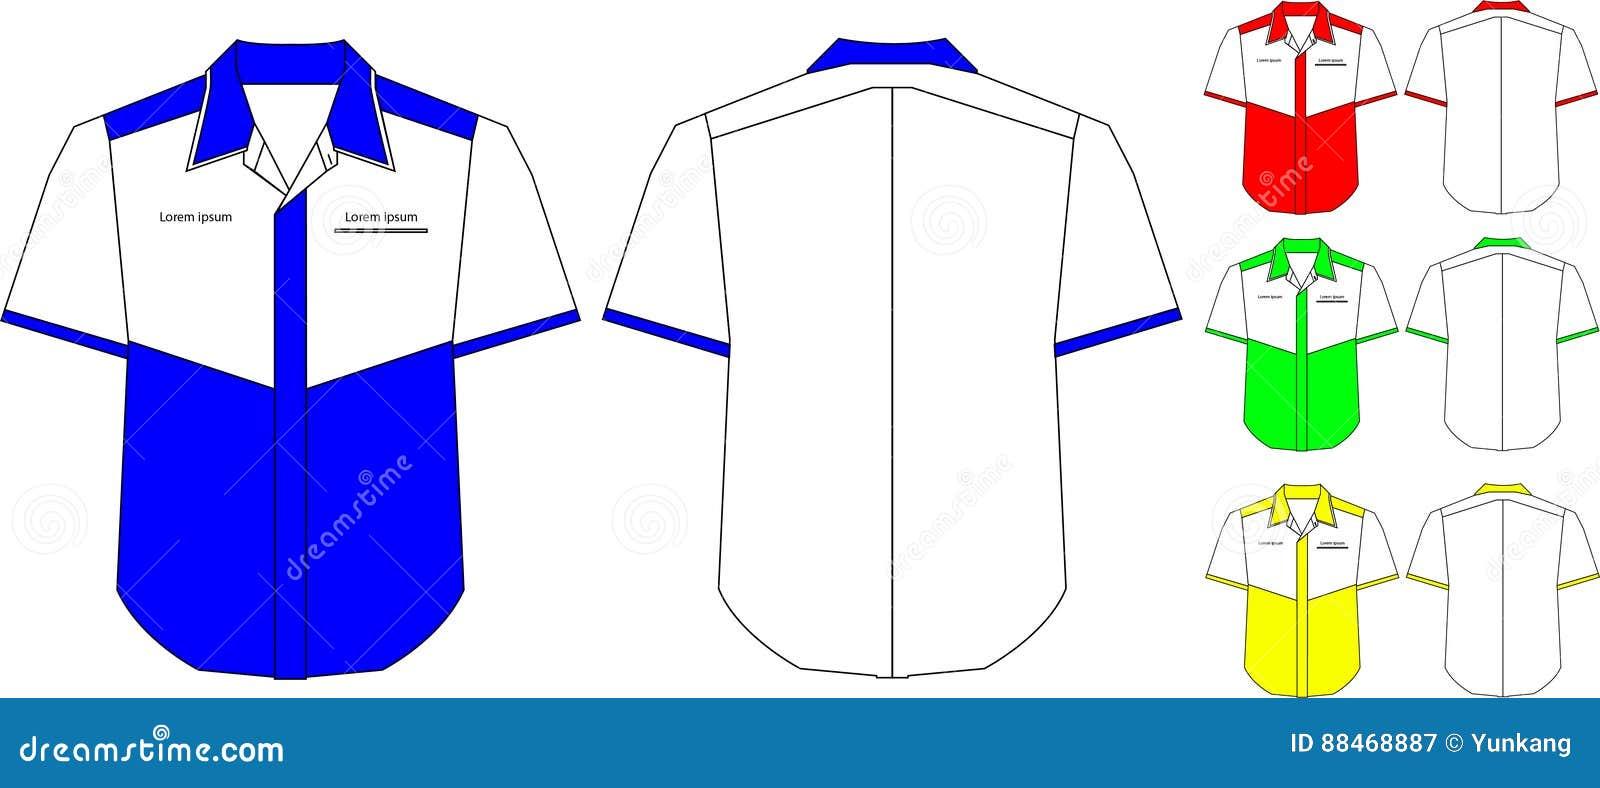 Collar Shirt Design Template